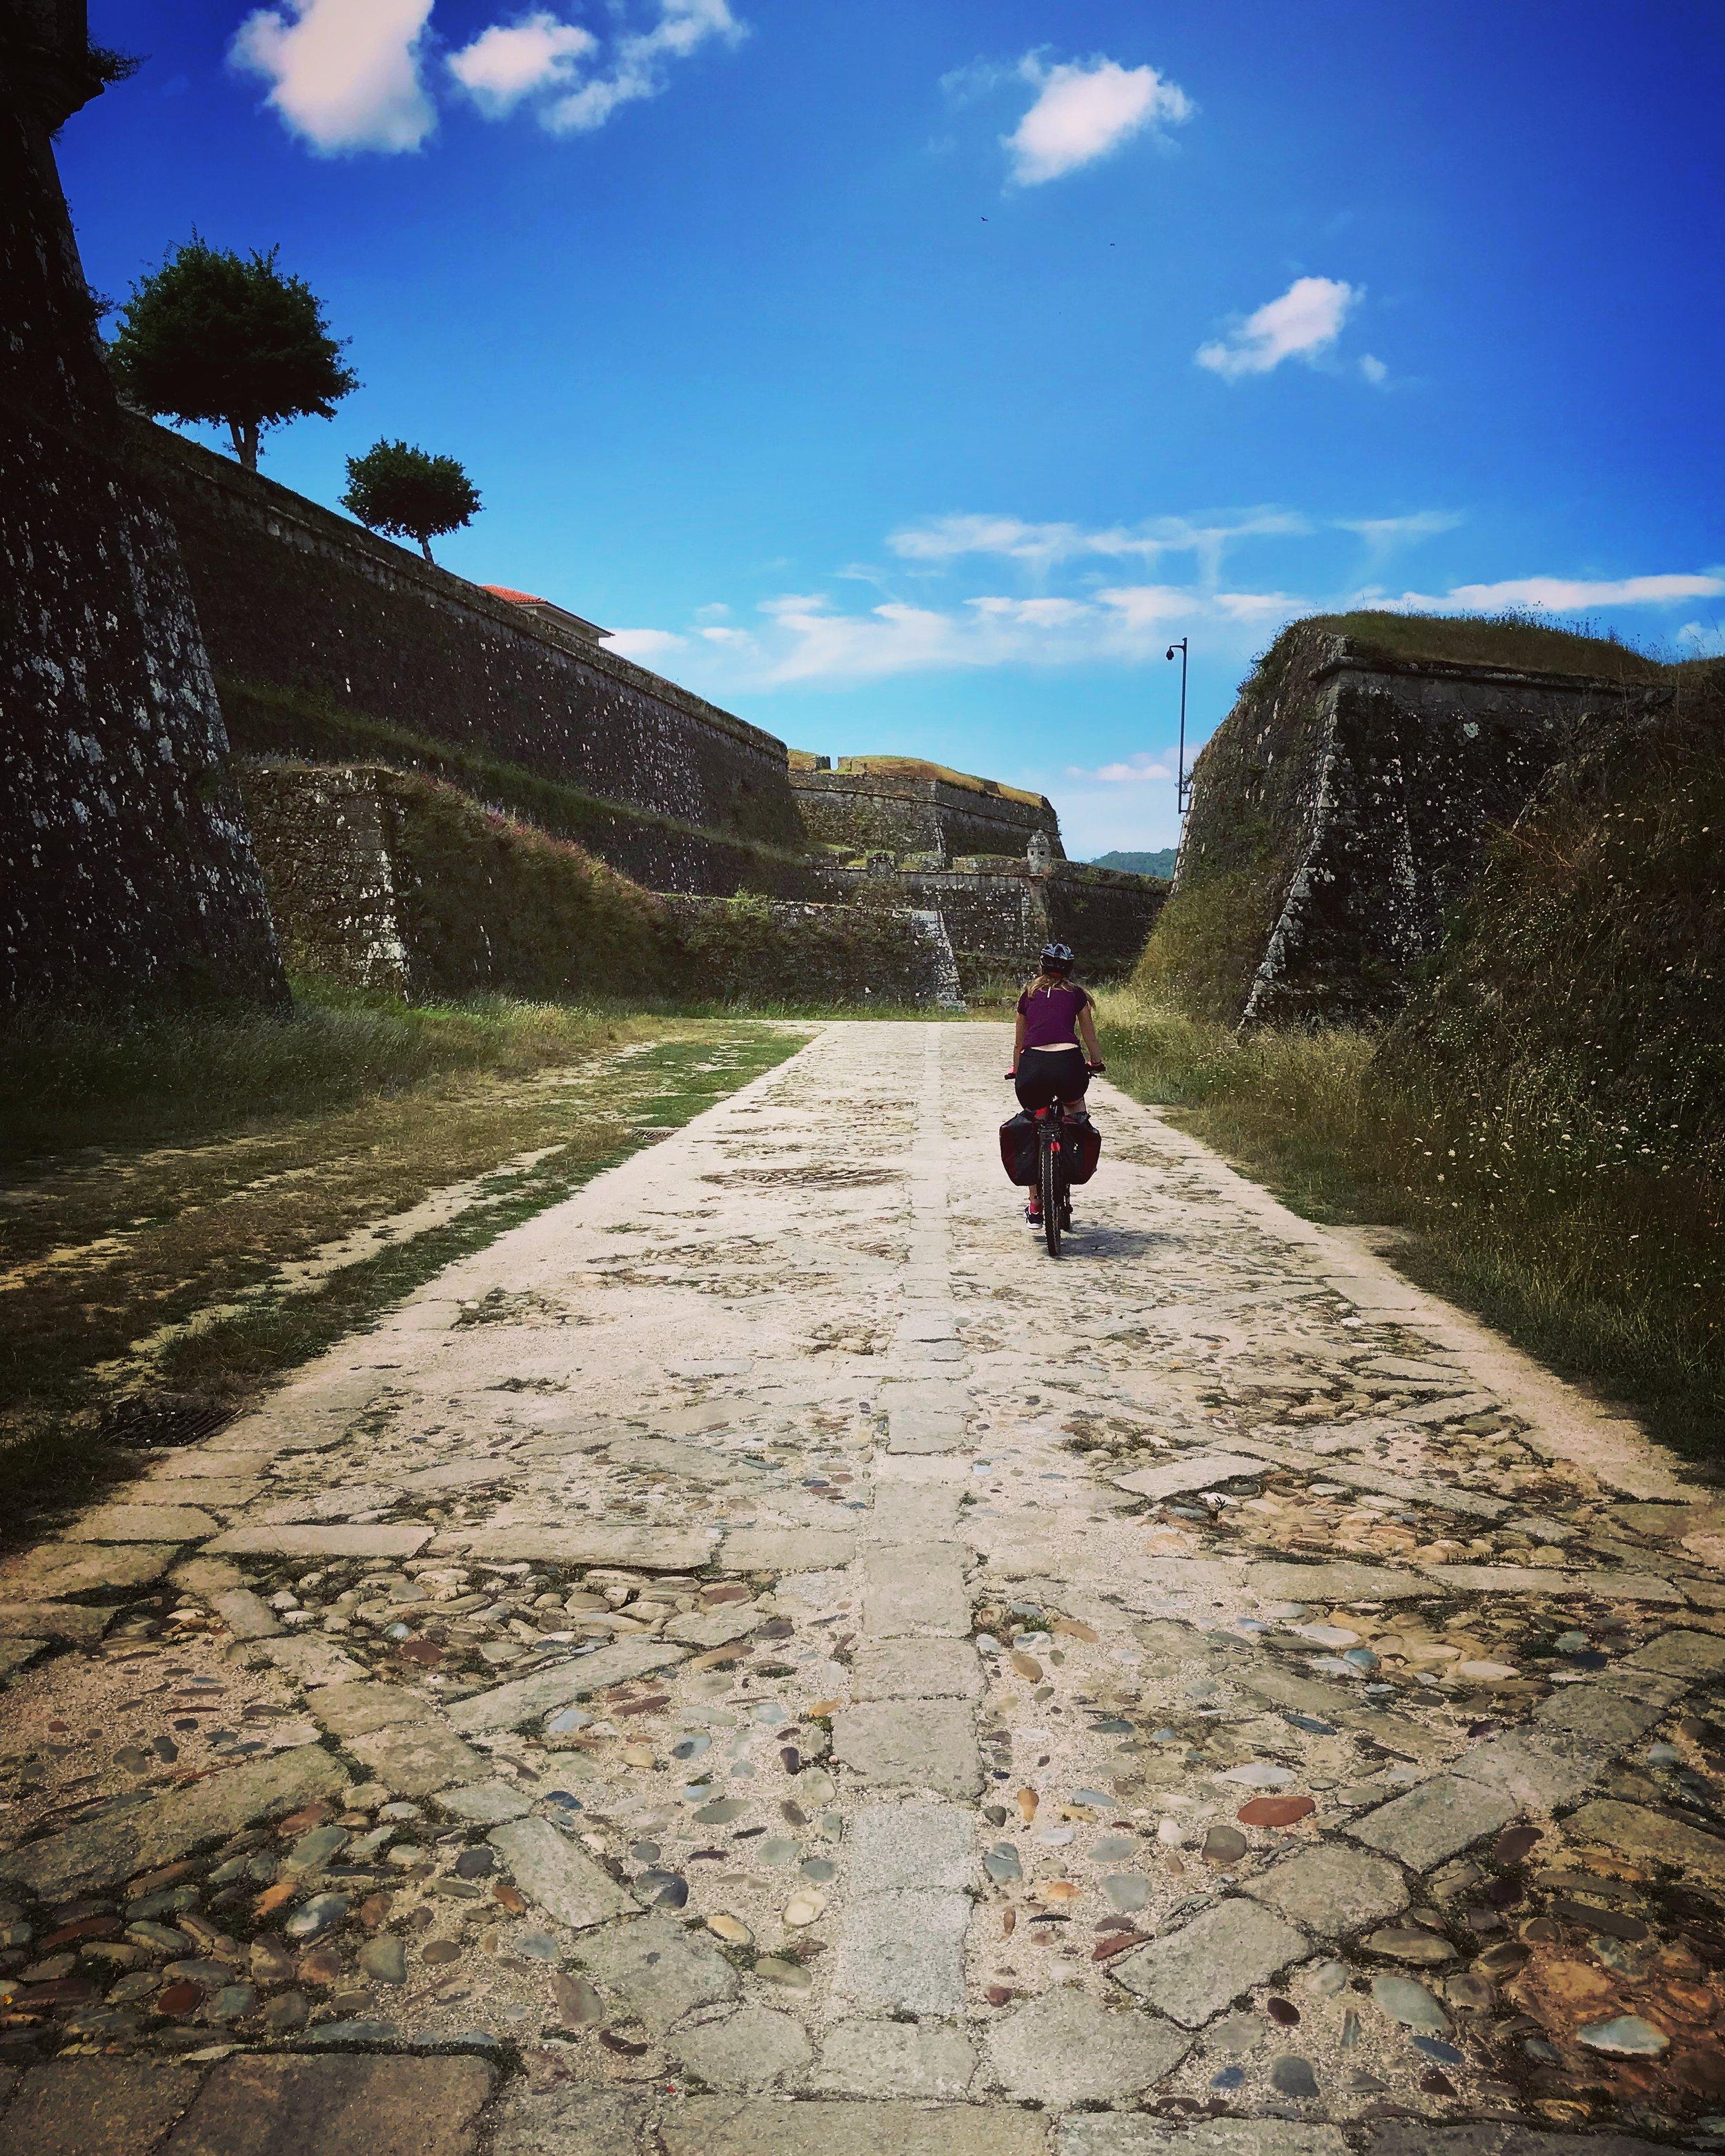 Bordering the fortress of Valença do Minho (Portugal) built between XVII - XVIII